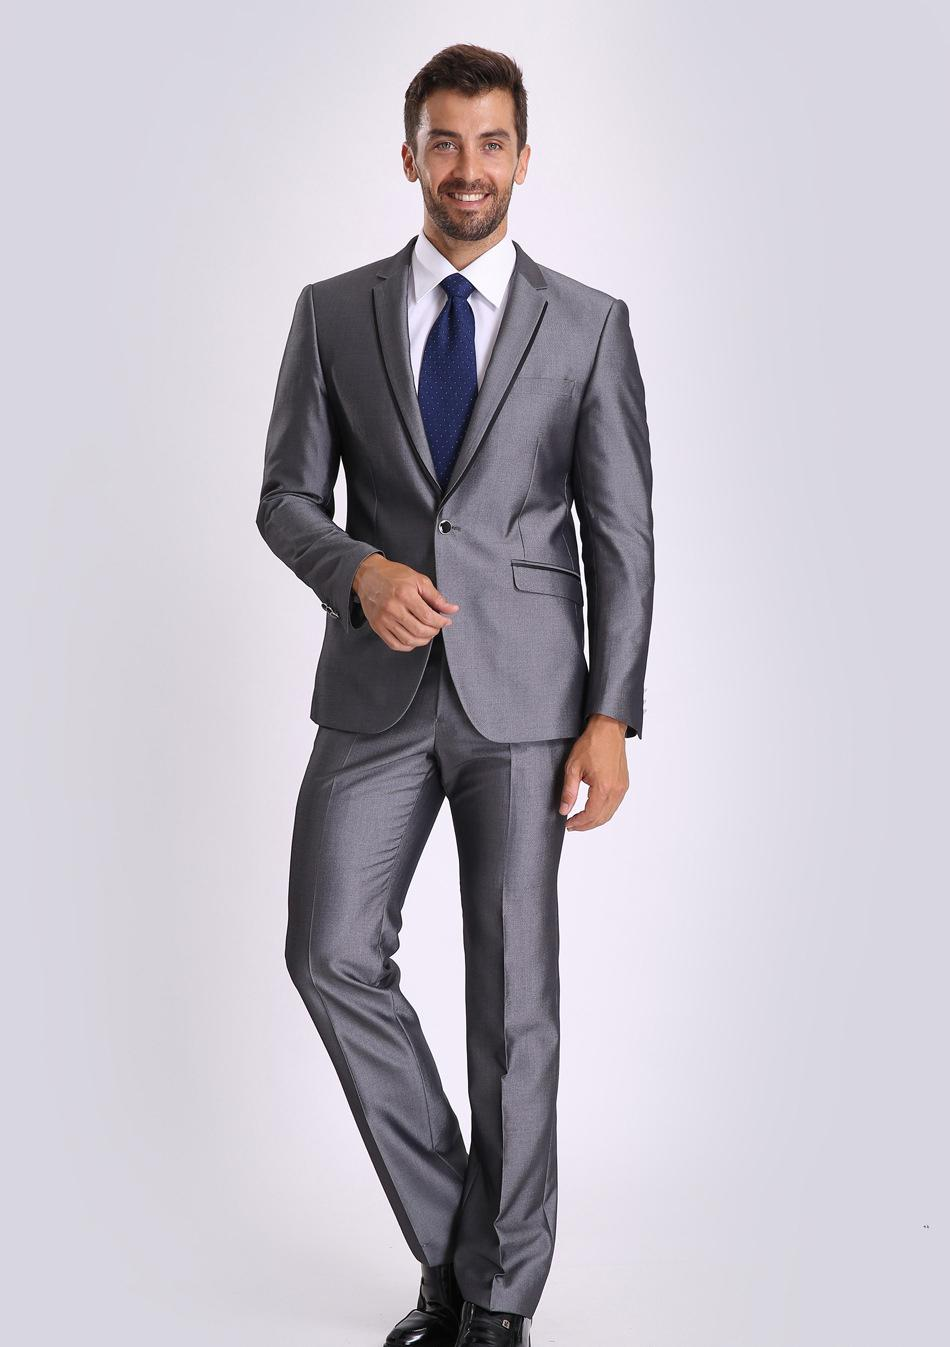 new design back vent grey groom tuxedos slim fit business suit new design back vent grey groom tuxedos slim fit business suit professional interview suit jacket pants tie 437